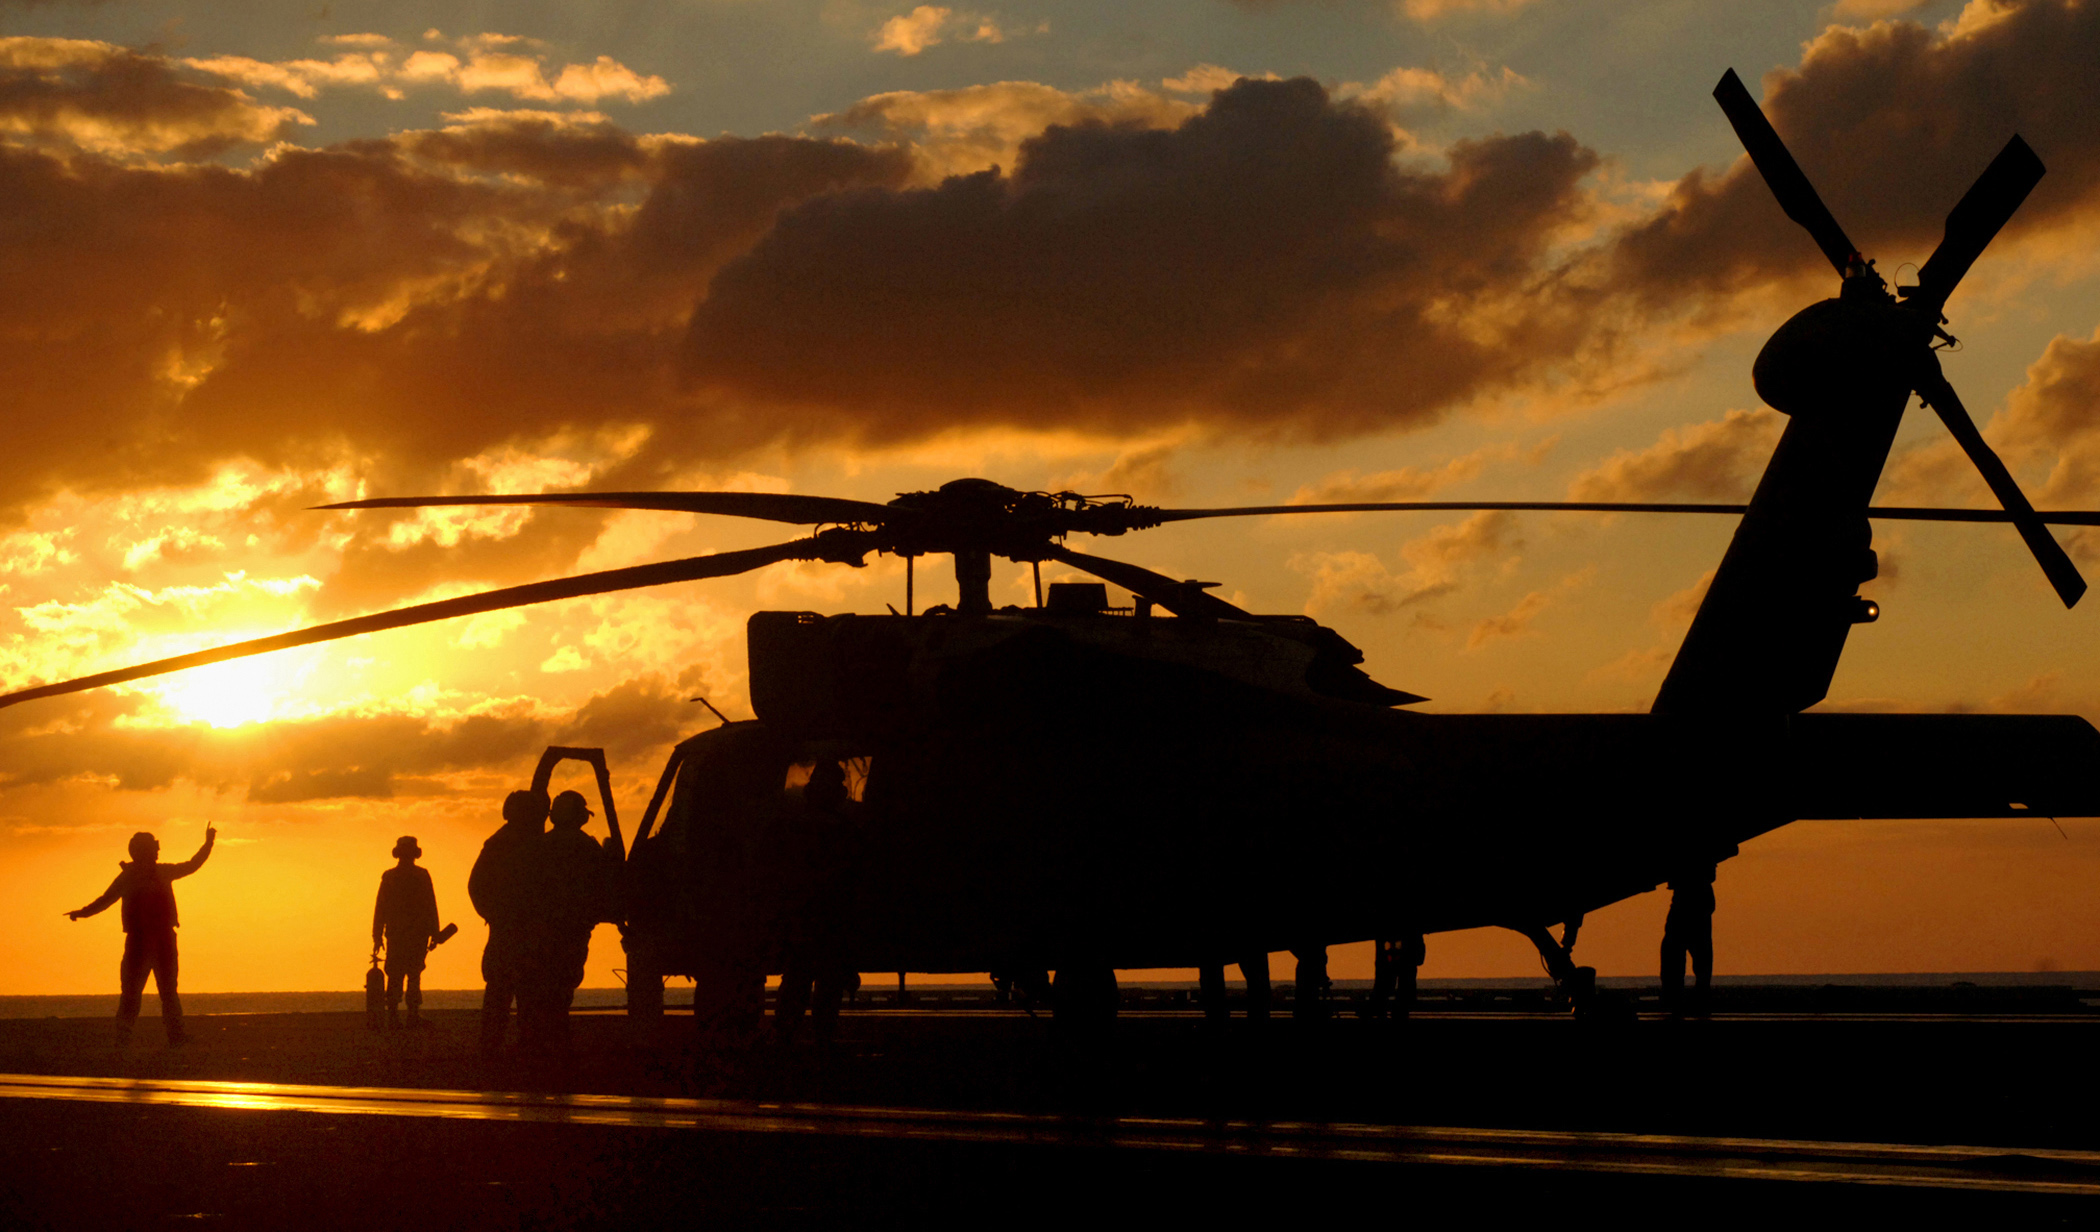 black hawk helicopter wallpaper